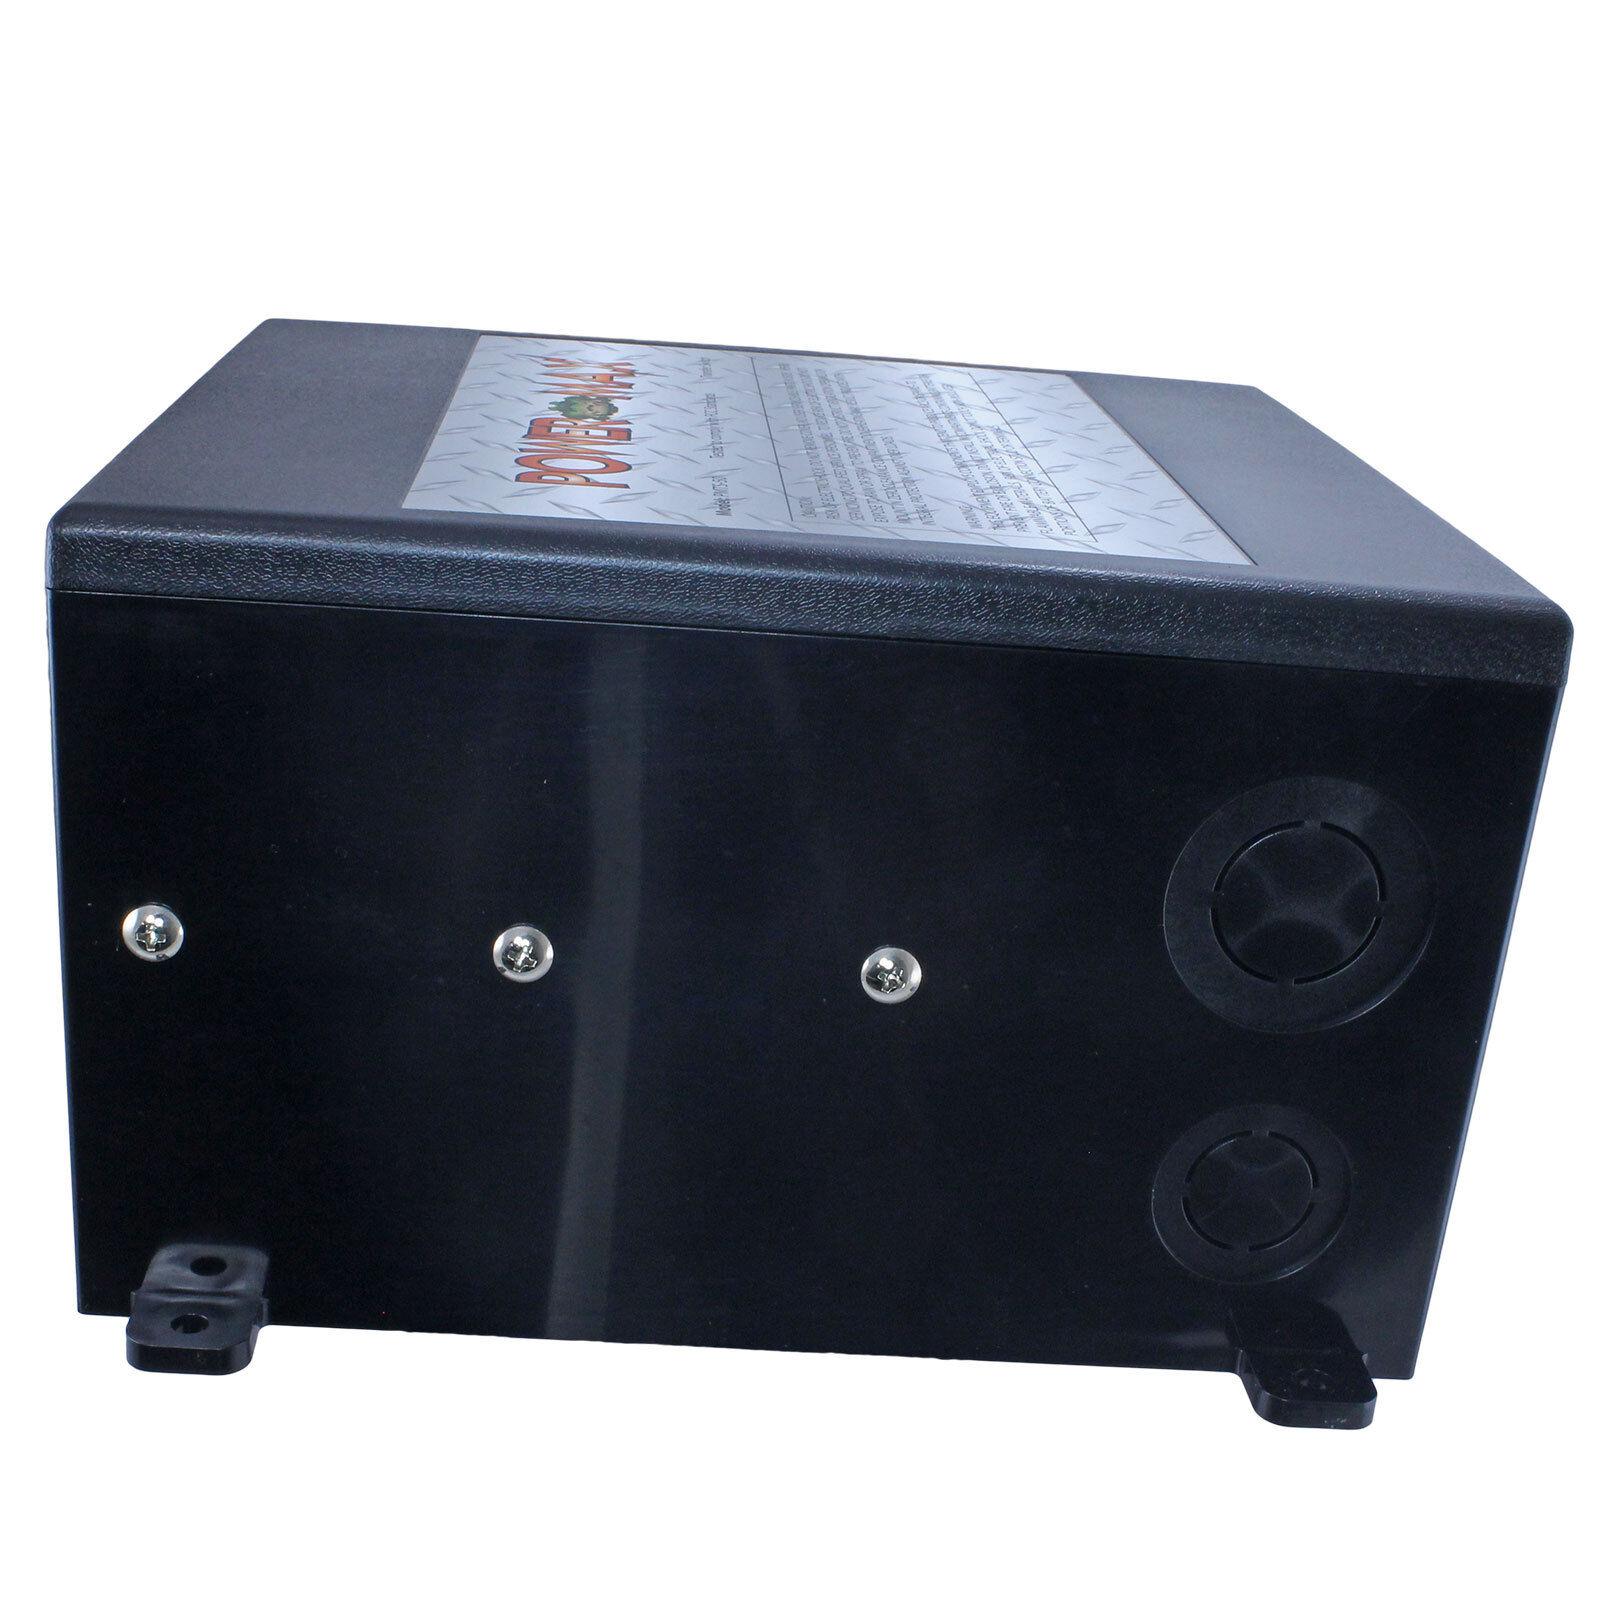 Automatic Sitemap Generator: POWERMAX PMTS-50 AMP 120 240 VAC RV GENERATOR AUTOMATIC